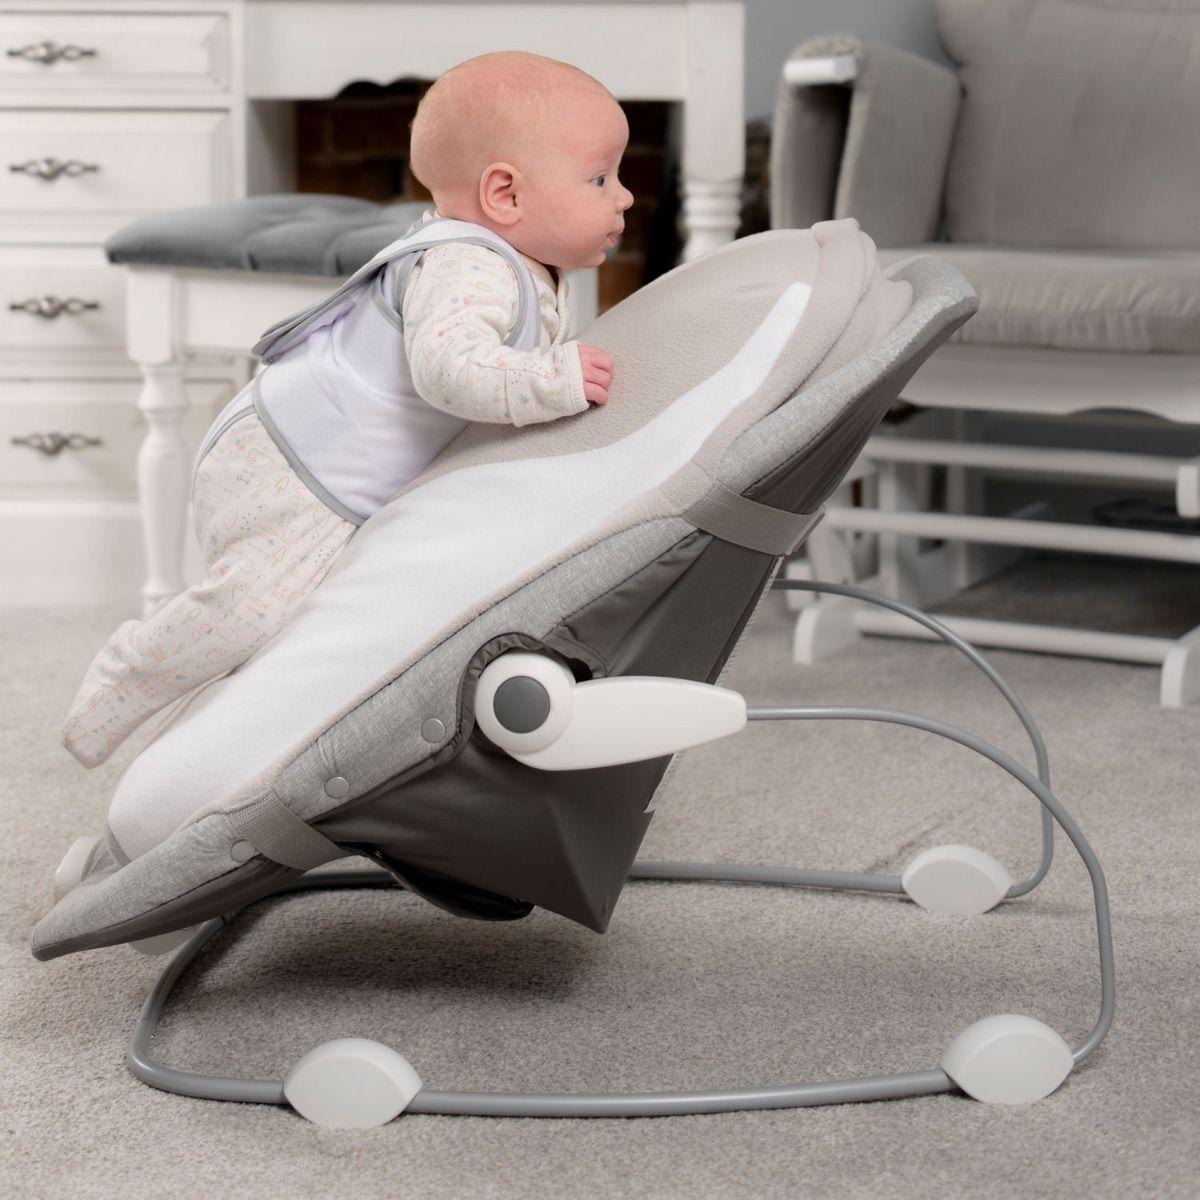 Babocush Newborn Comfort Cushion Your One Stop Baby